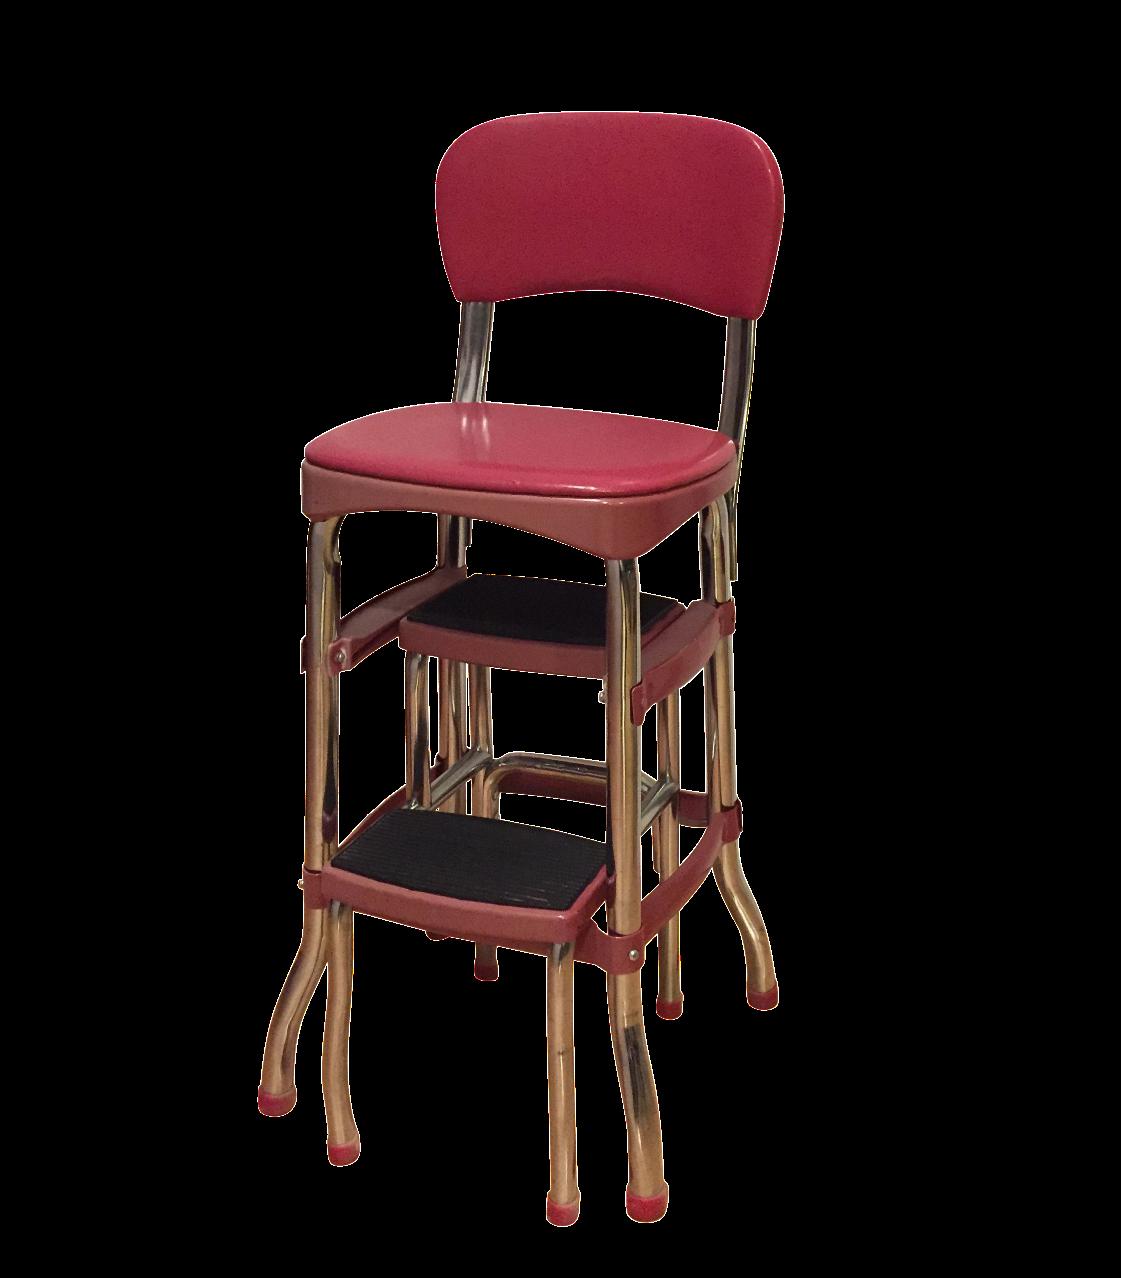 Mid Century Red Vinyl Step Stool Chairish